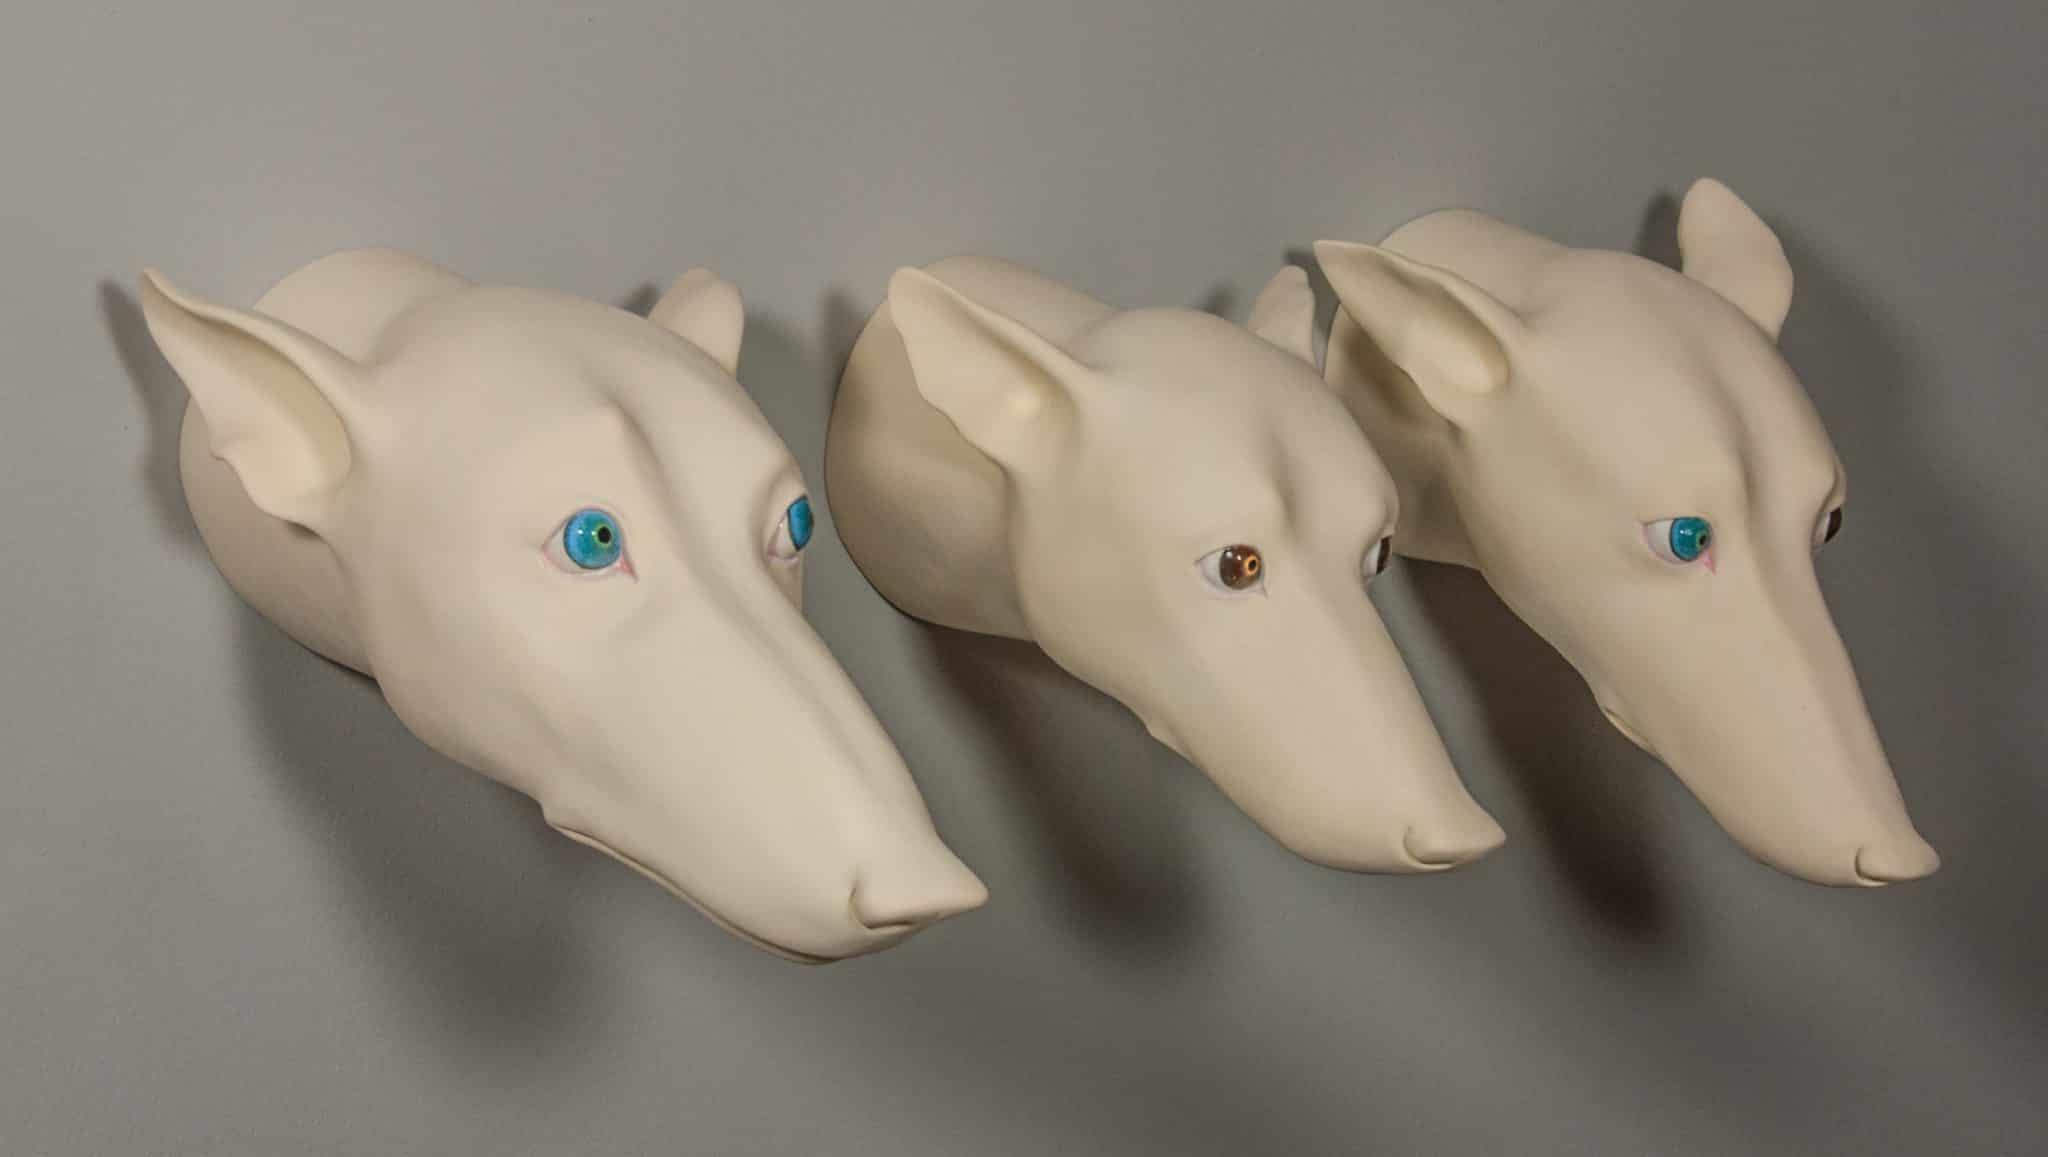 Marina Kuchinski – Solid Clay Construction of a Dog Head